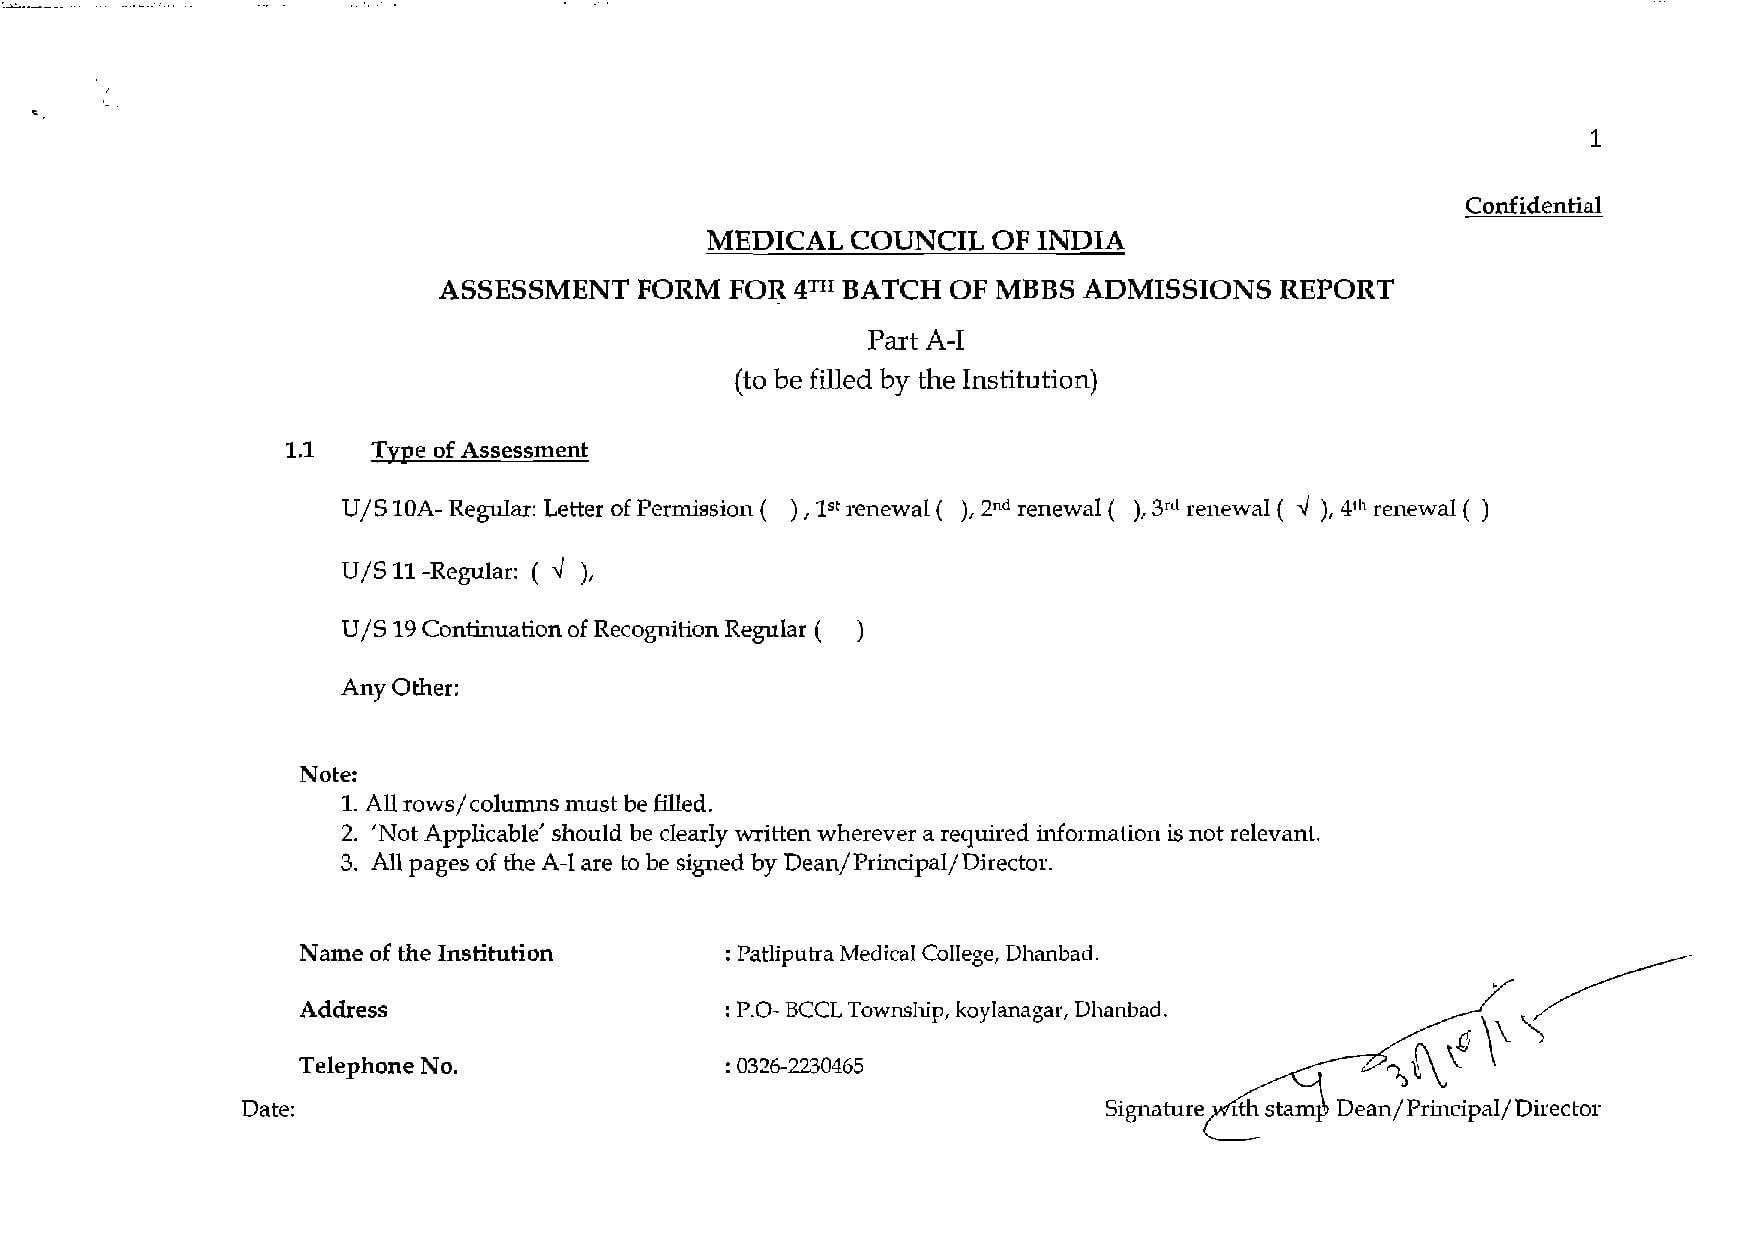 Patliputra Medical College & Hospital - [PMCH], Dhanbad